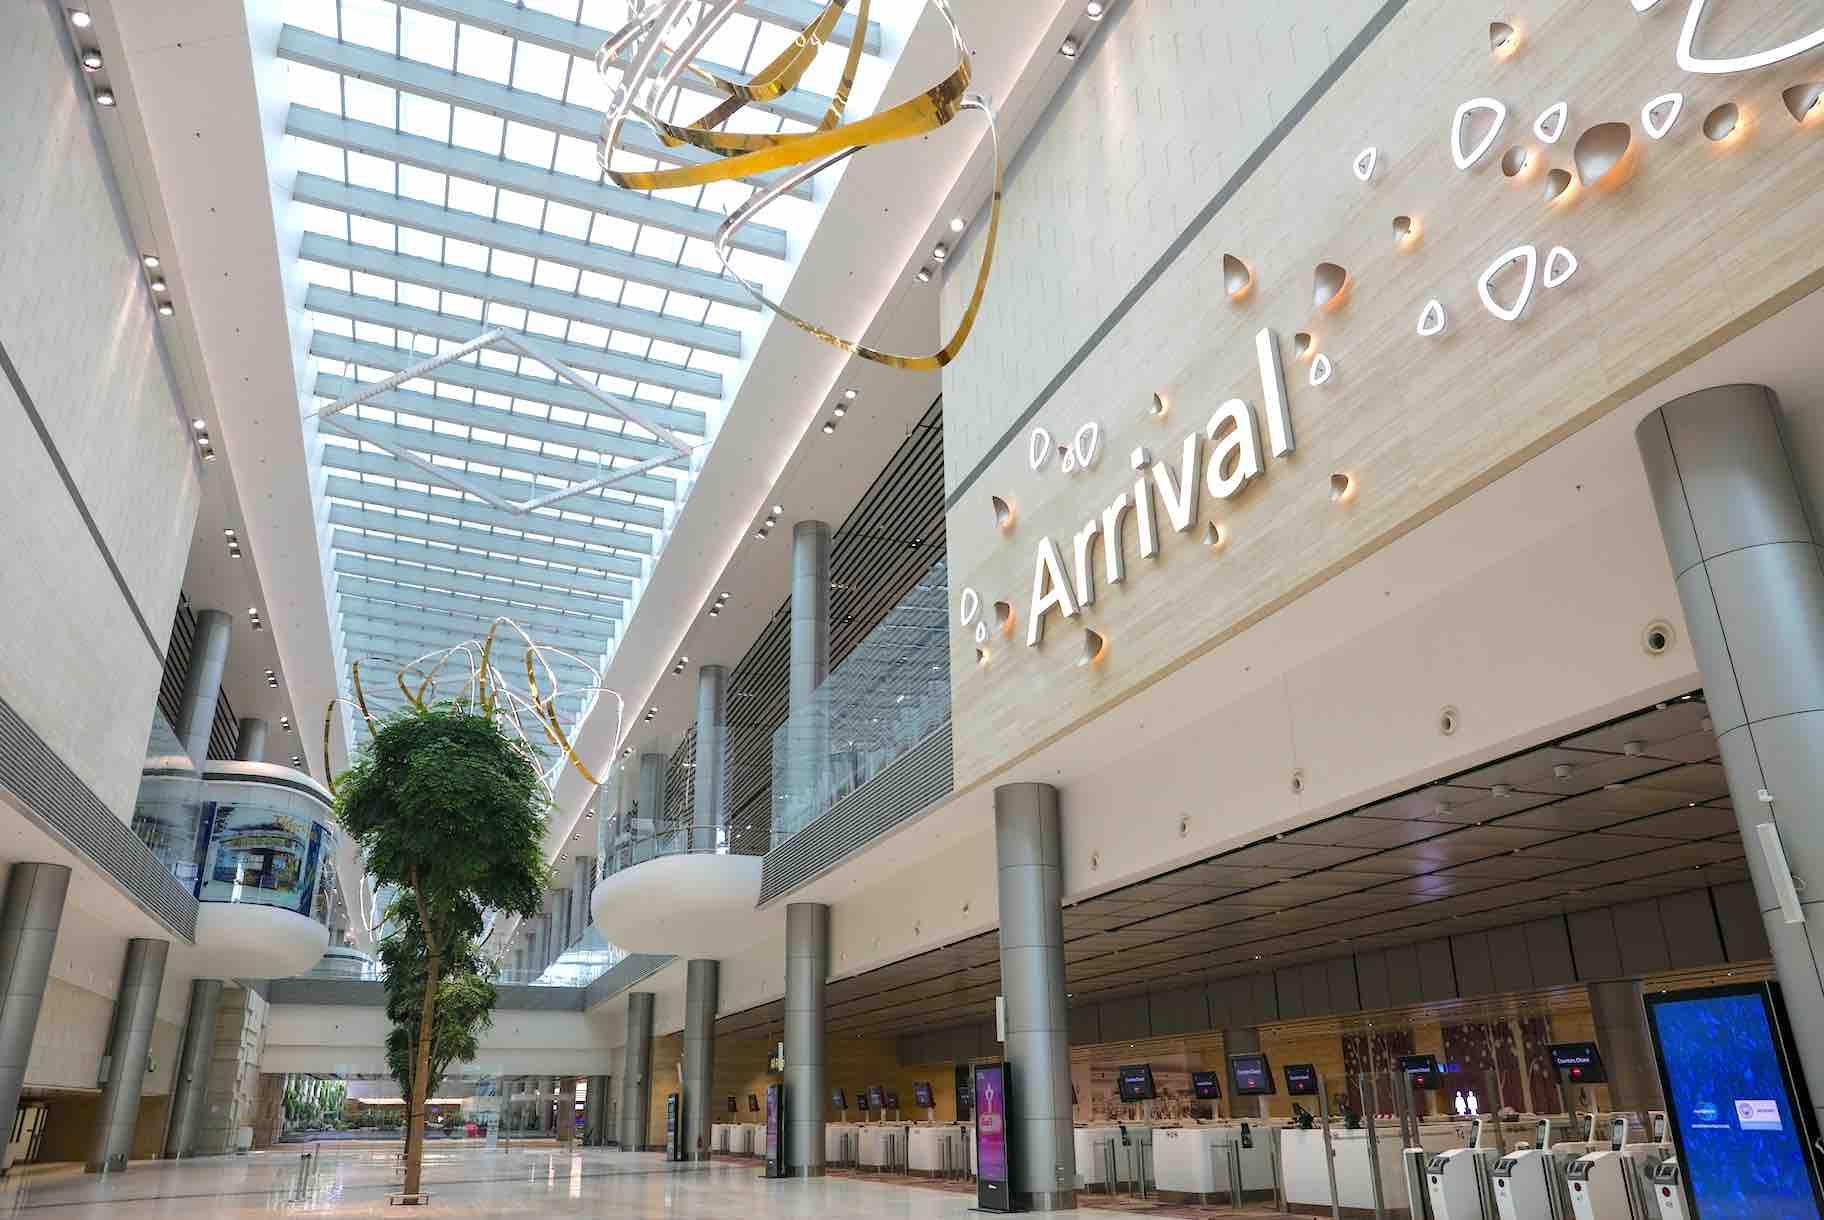 changi airport terminal 4 petalcloud fast departure. Black Bedroom Furniture Sets. Home Design Ideas